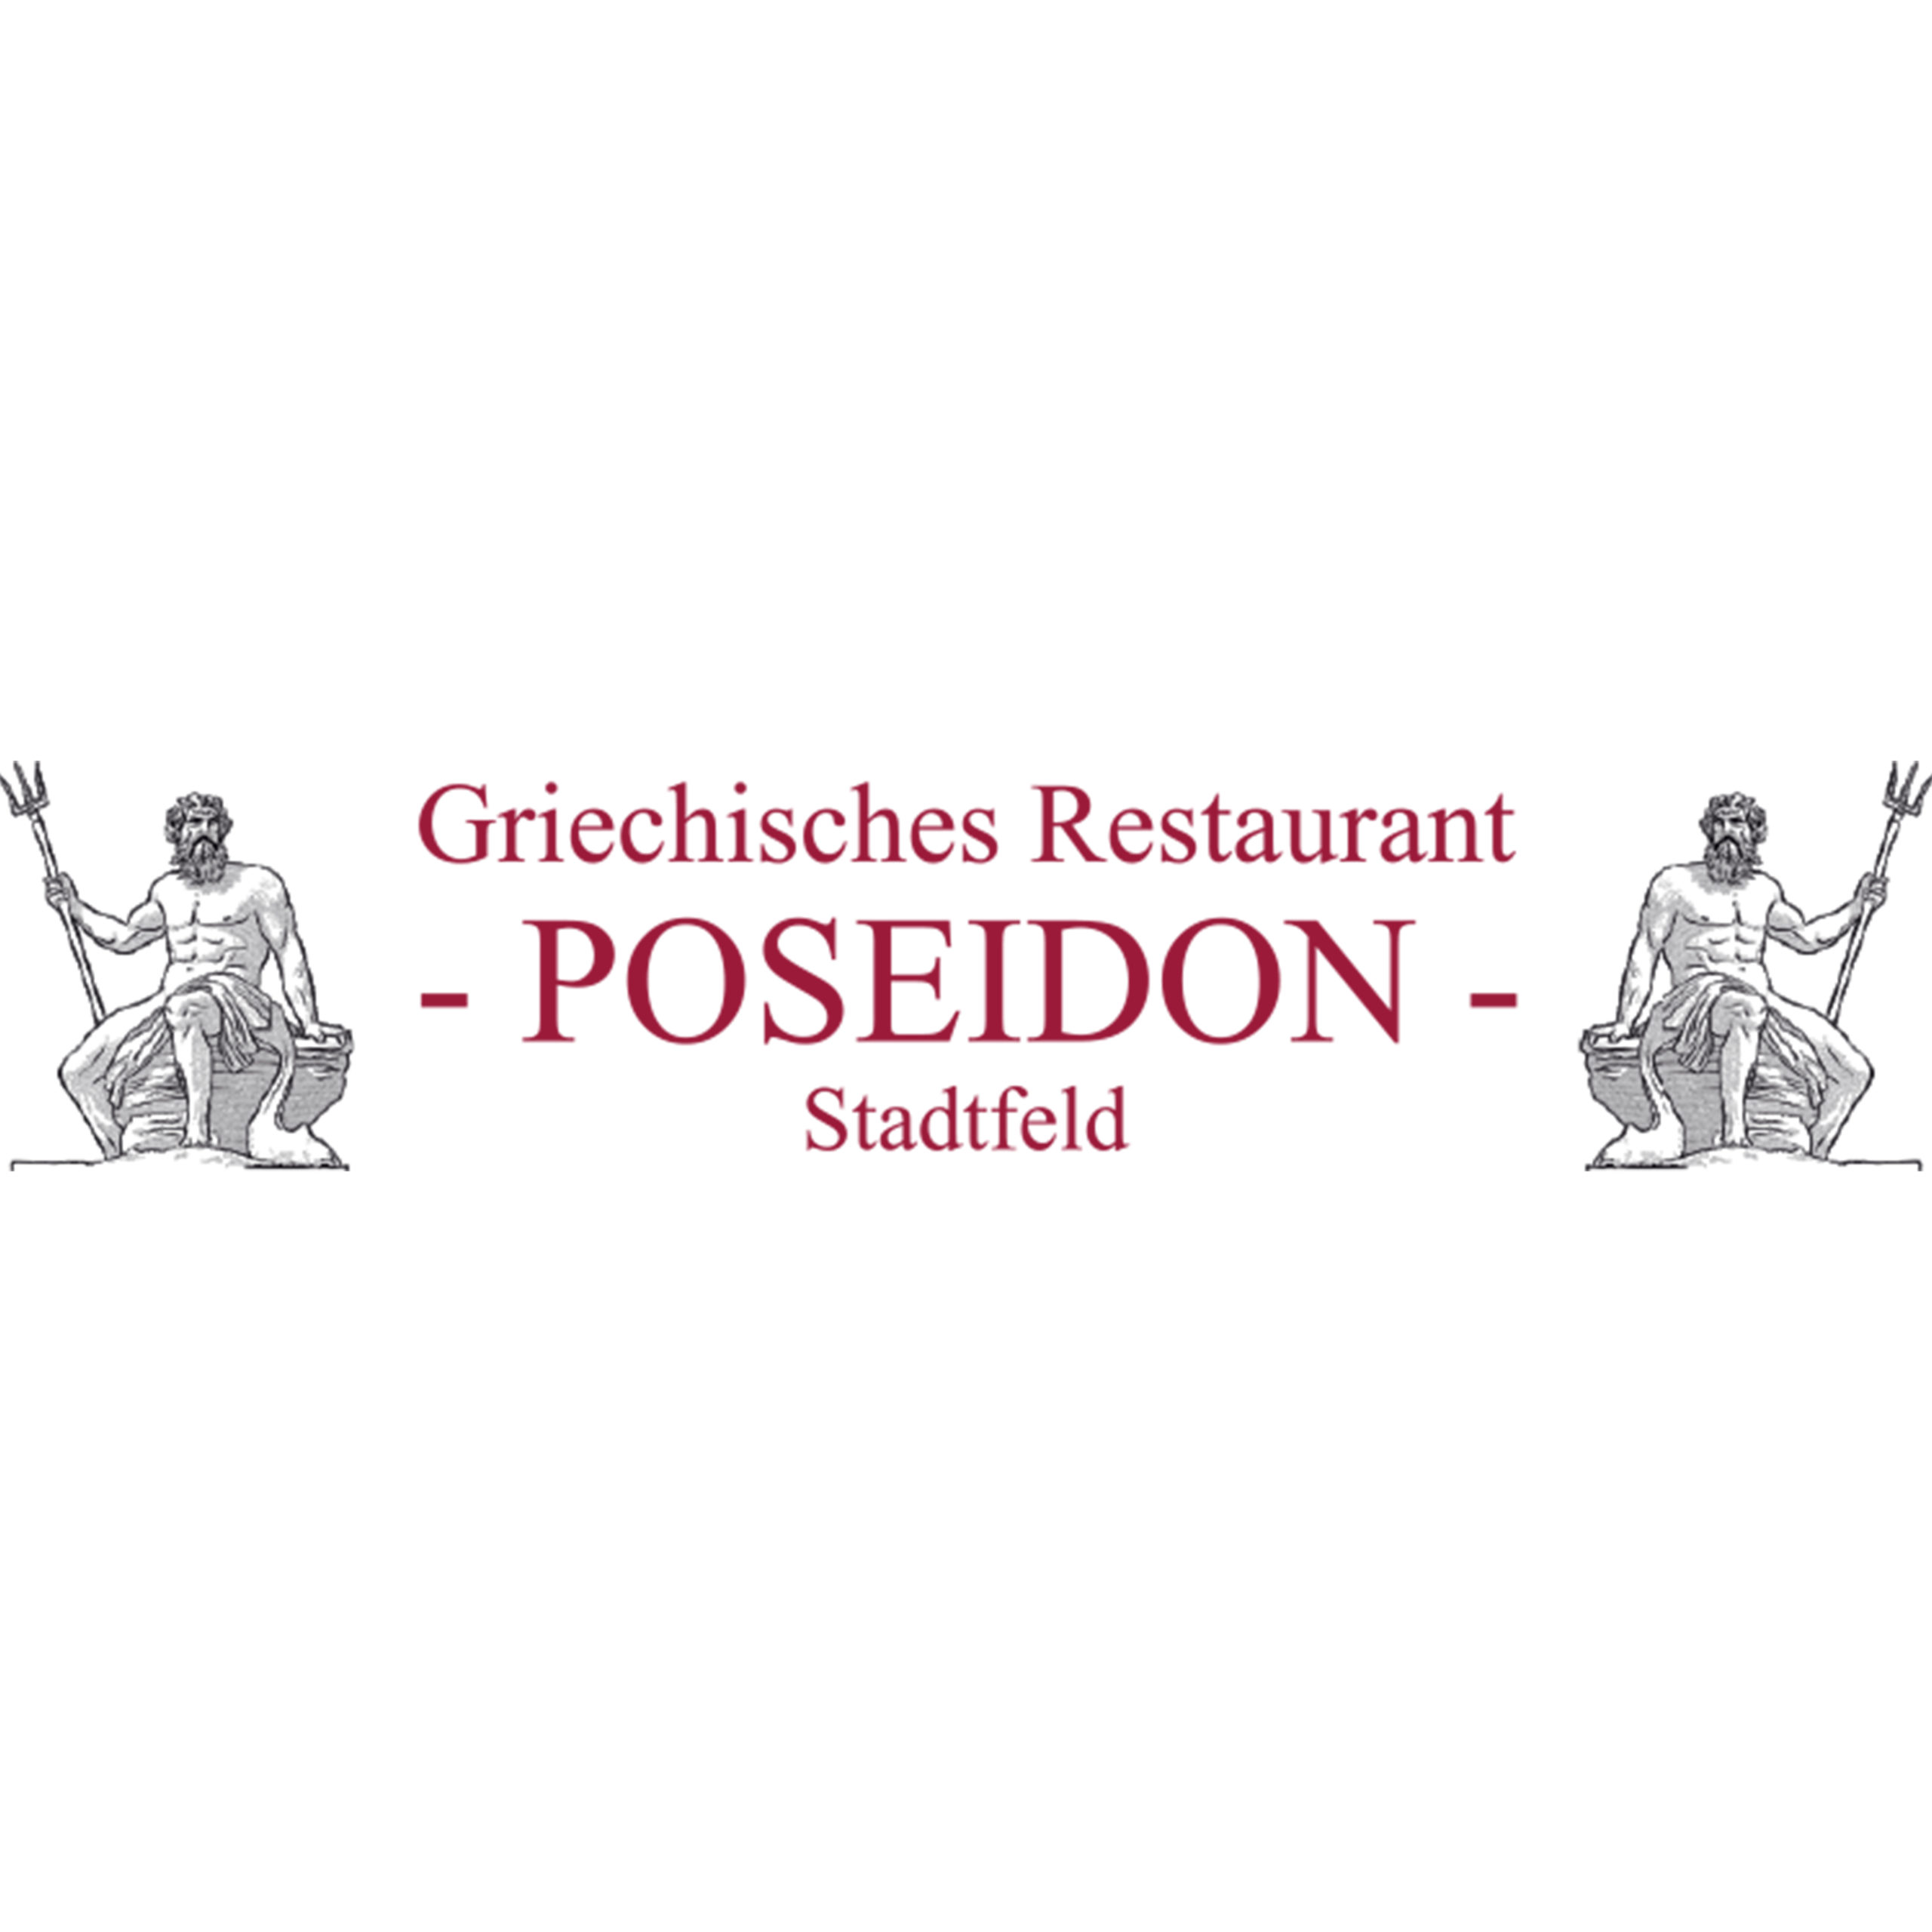 Griechisches Restaurant Poseidon Magdeburg